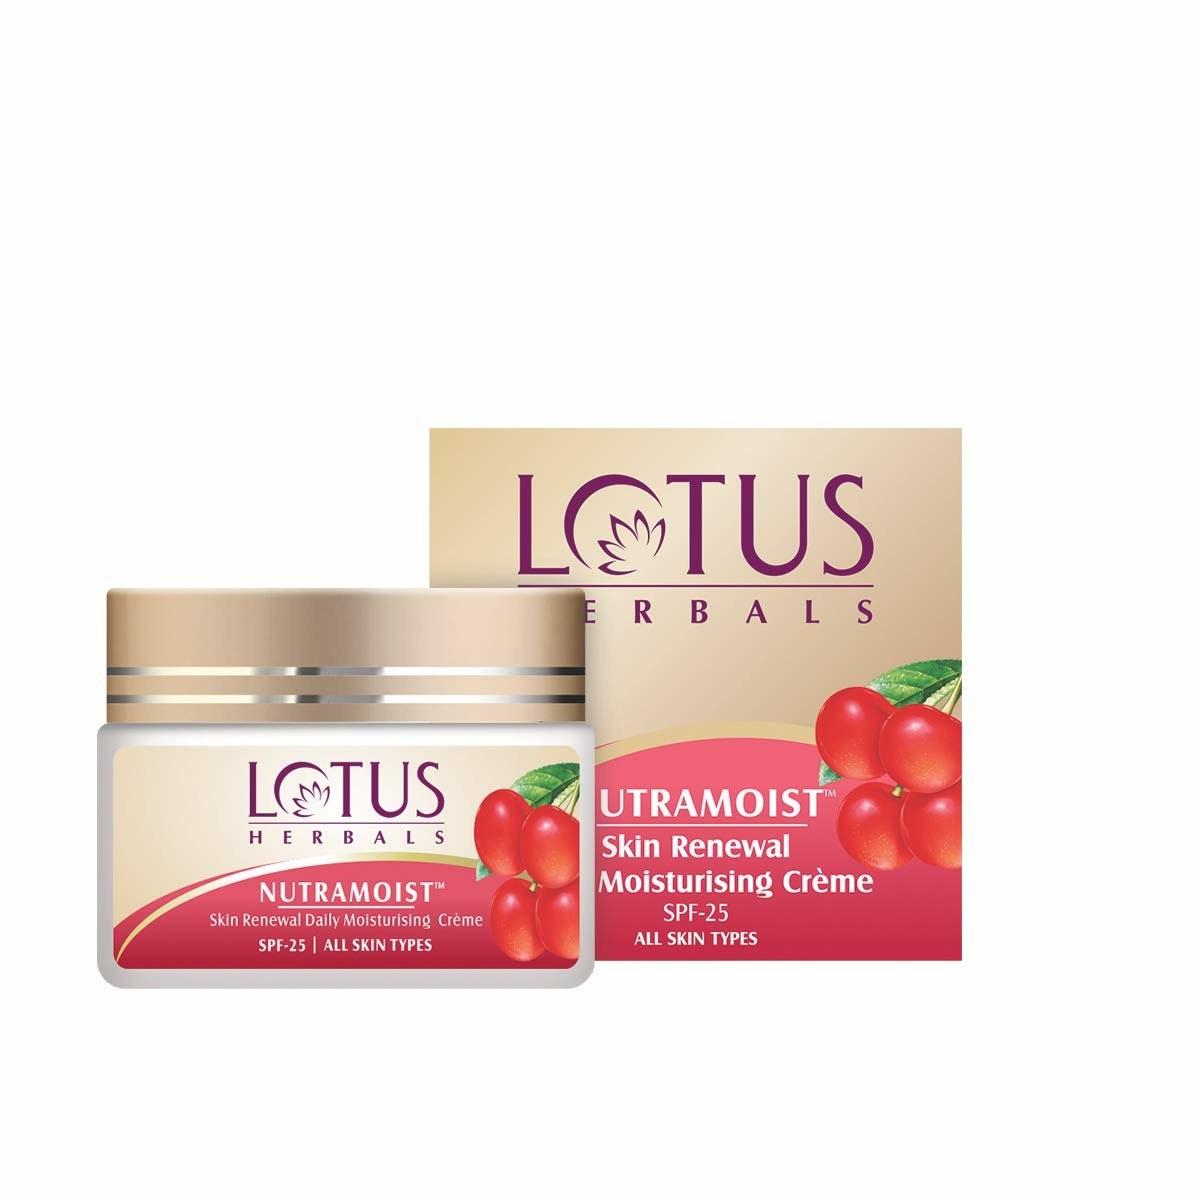 Packaging of the moisturising cream